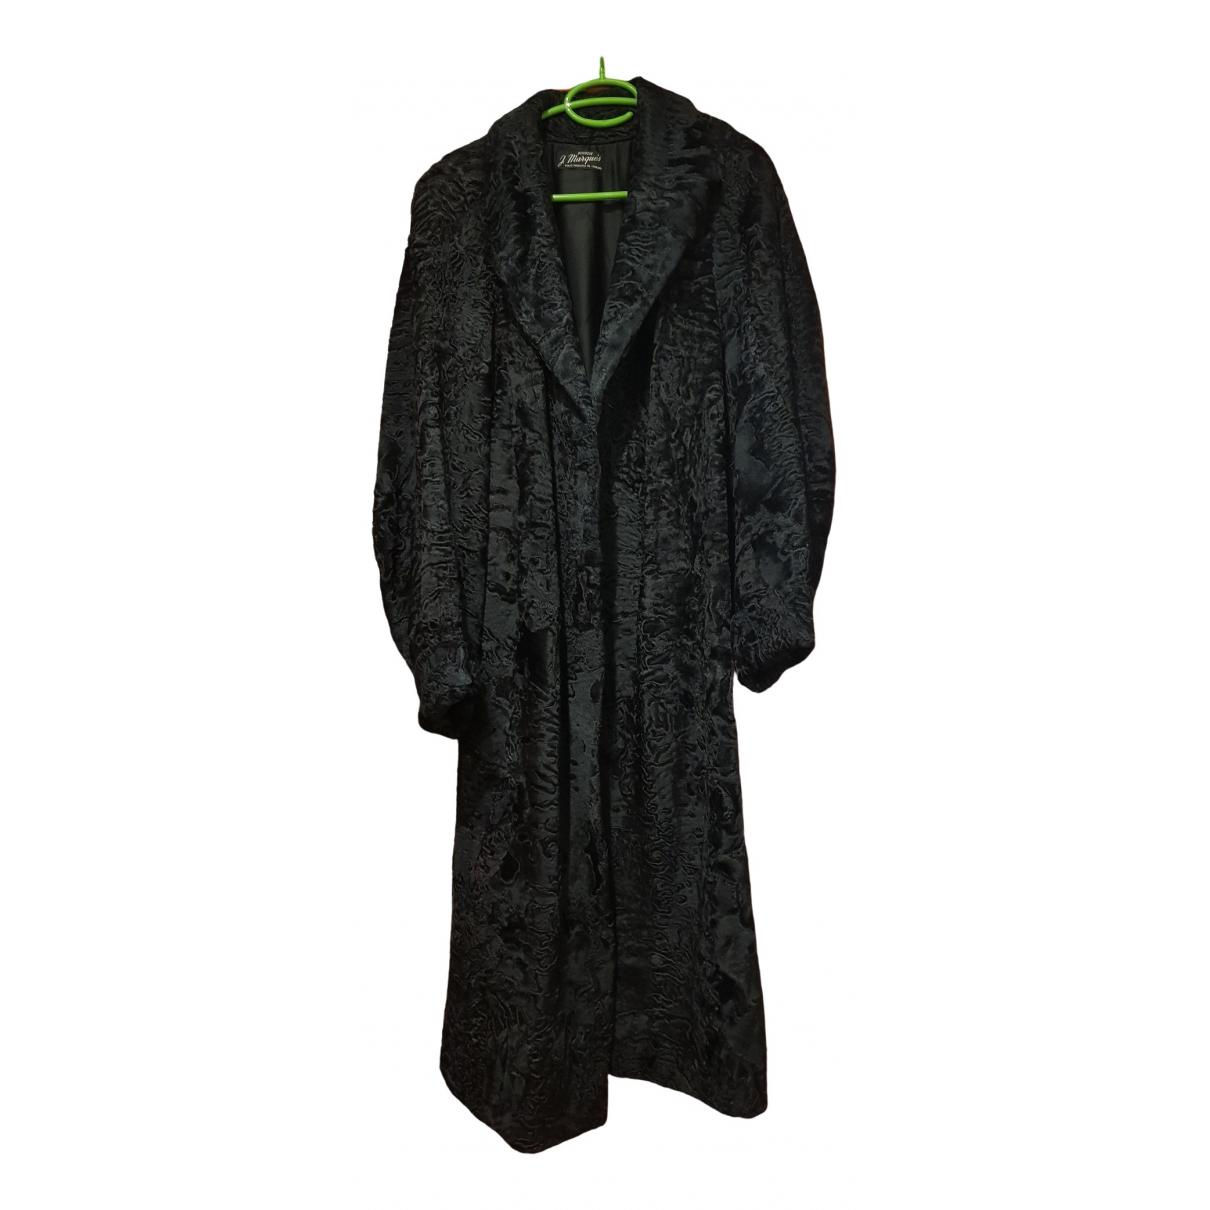 Marques Almeida \N Black Astrakhan coat for Women One Size FR